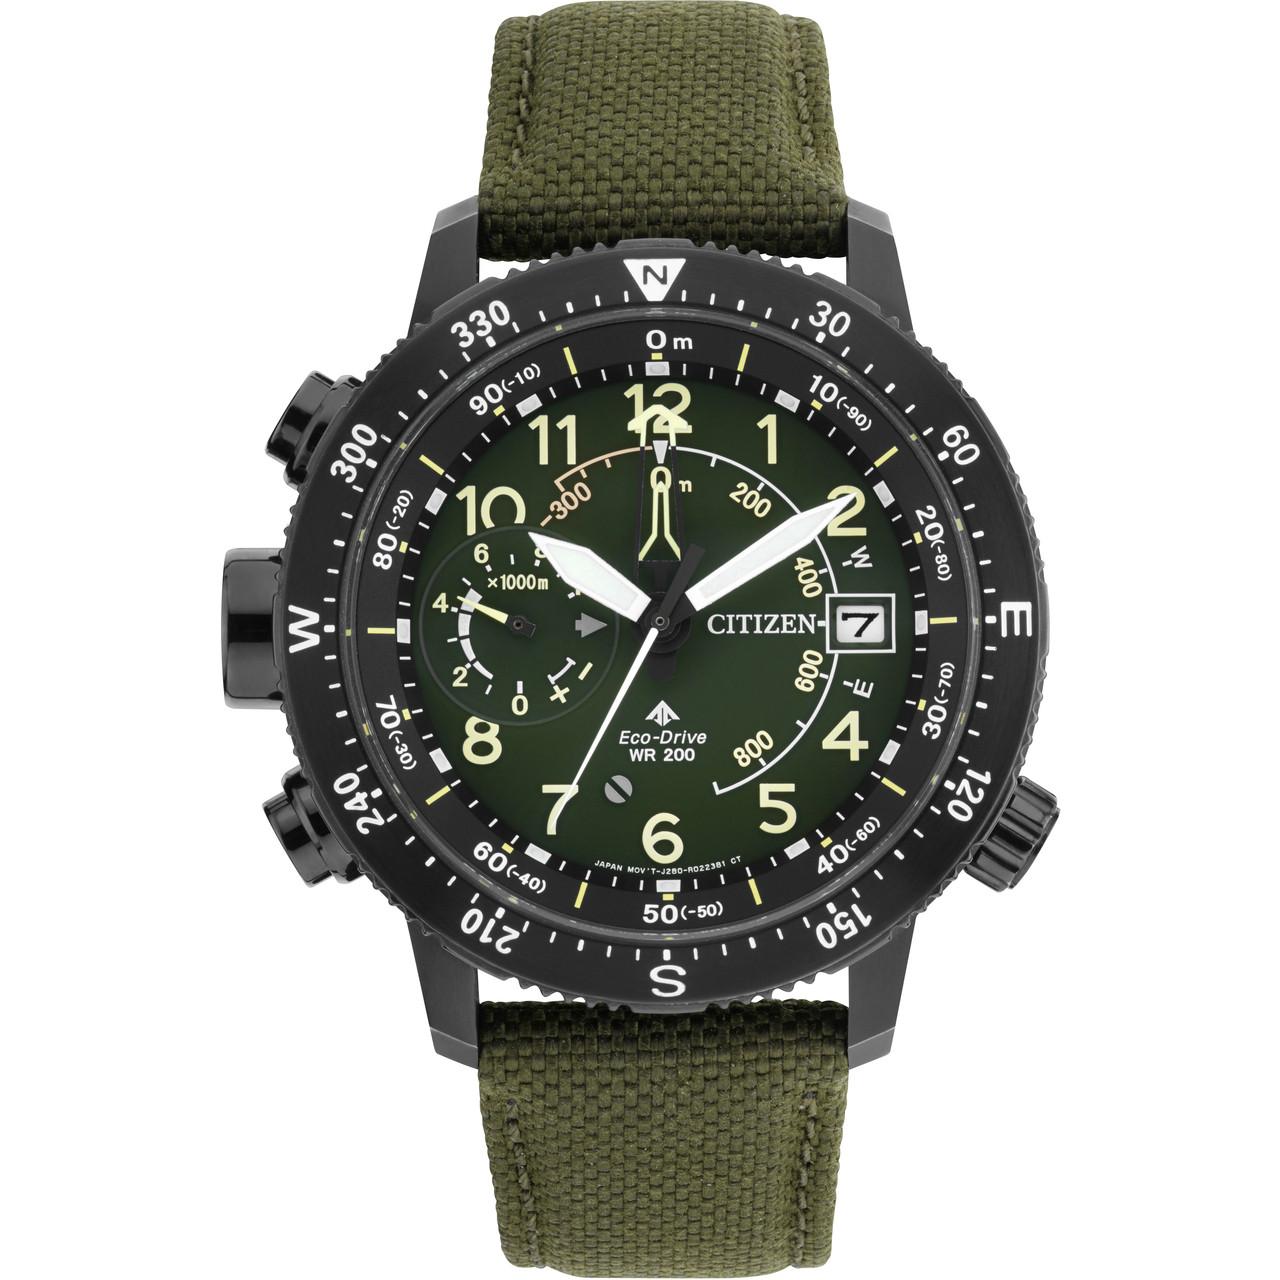 Citizen Eco Drive Promaster Altichron Men S Green Dial Nylon Strap Watch Bn4045 12x